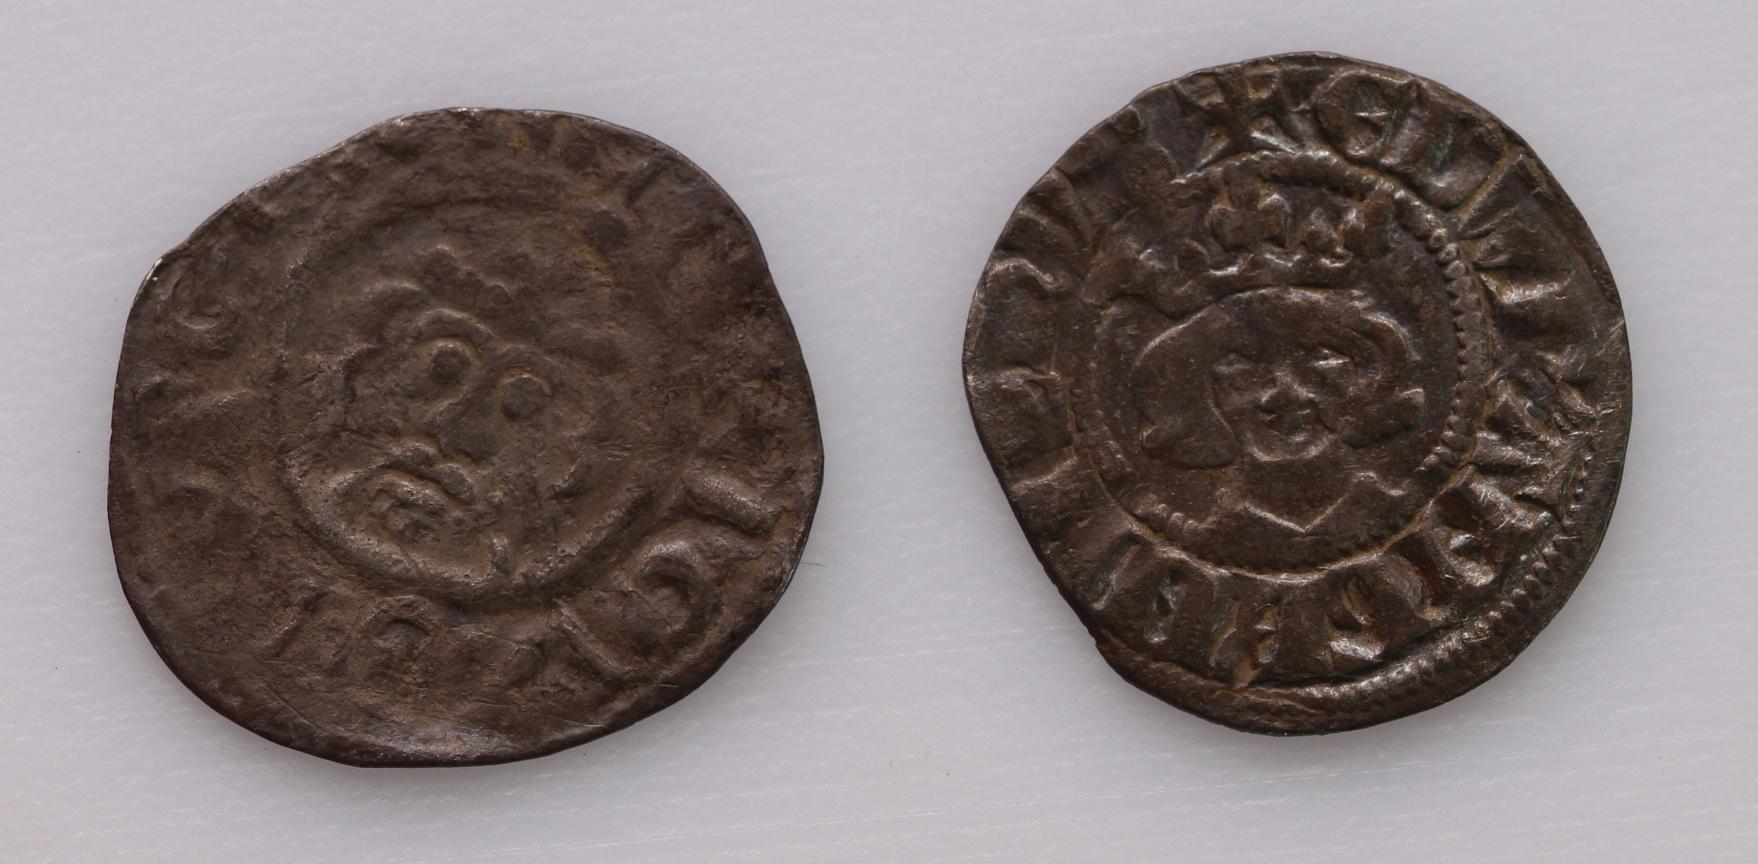 Canterbury Mint Pennies (2): Richard I Class 4b, S.1348C, REINALD ON CA, 1.26g, VG, along with